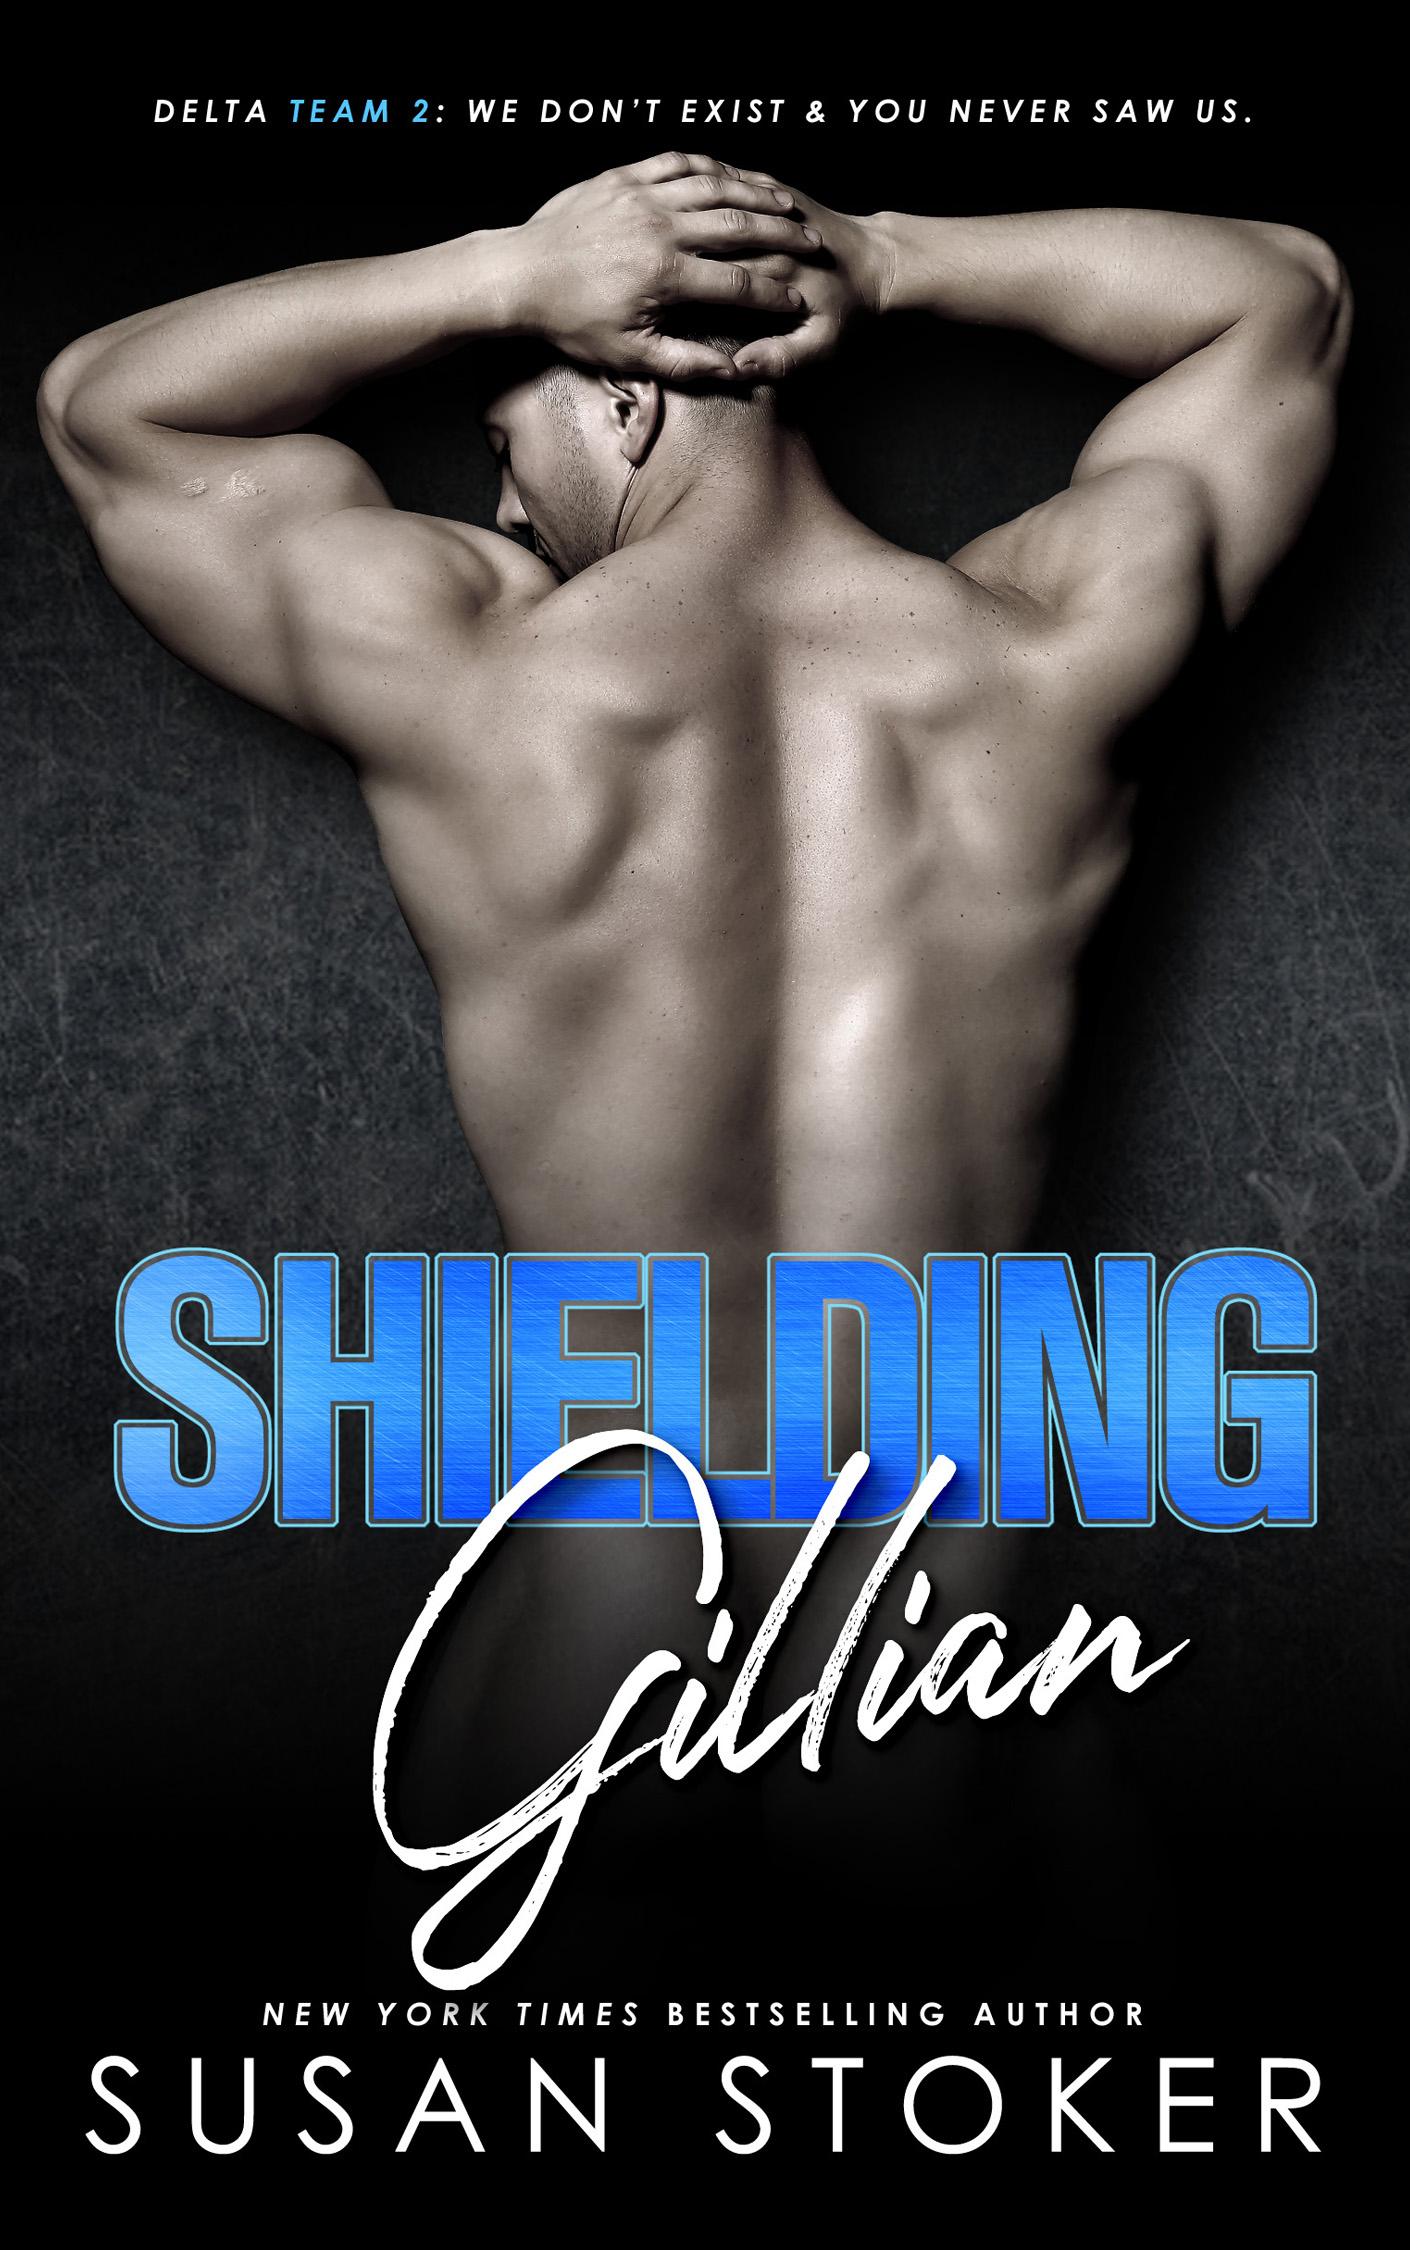 SHIEDLING GILLIAN